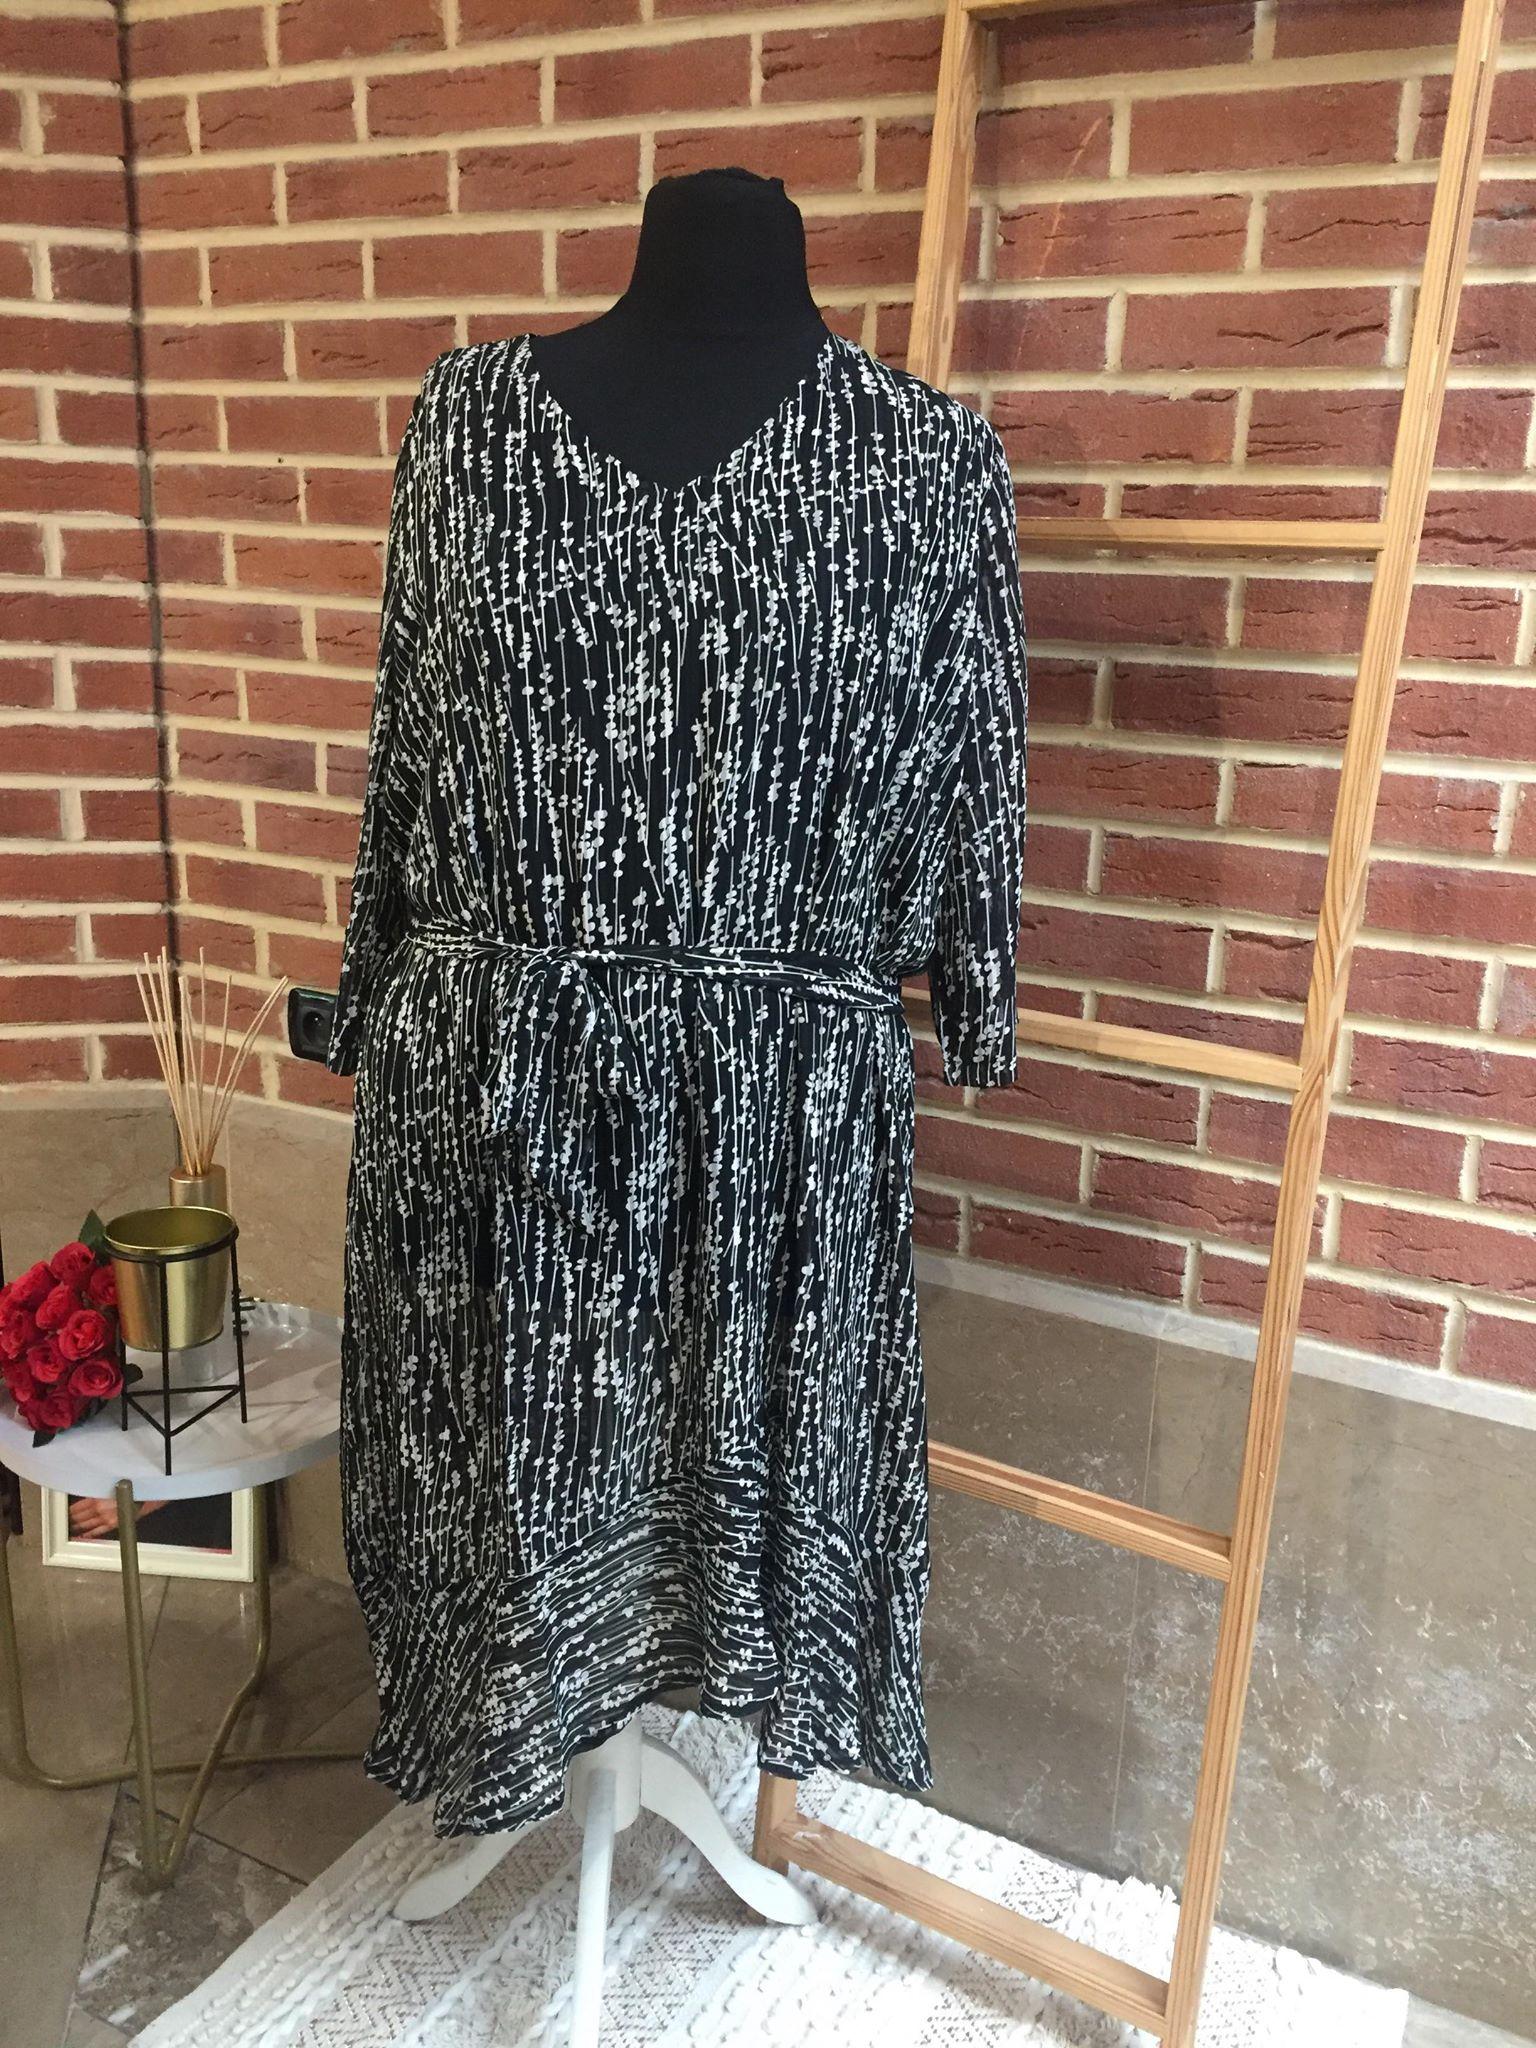 Longue robe noir  - LON_ROB_NOI_TRA_BLA_RON_BLA